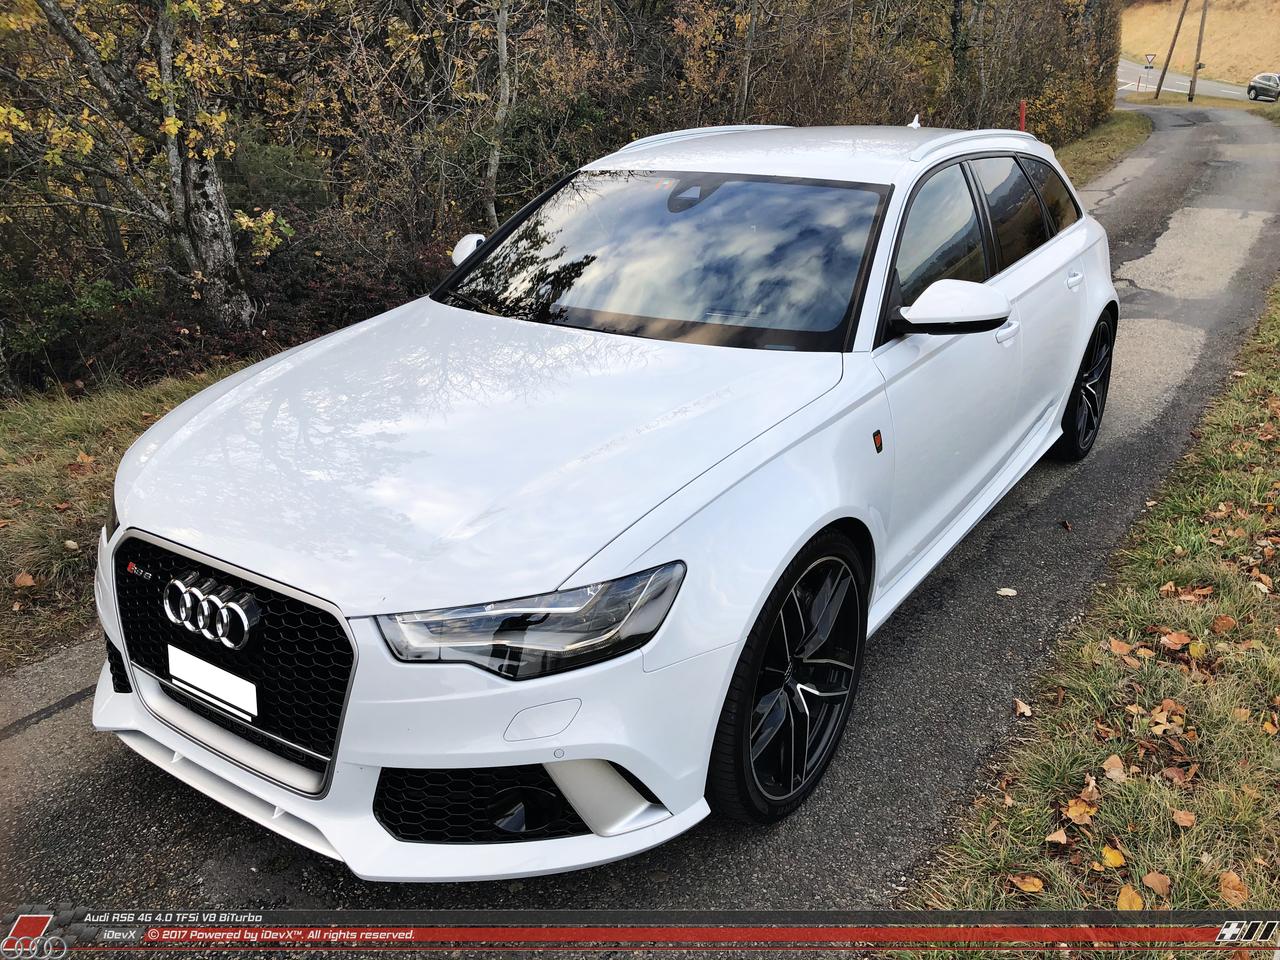 09_11.2018_Audi-RS6_iDevX_010.png